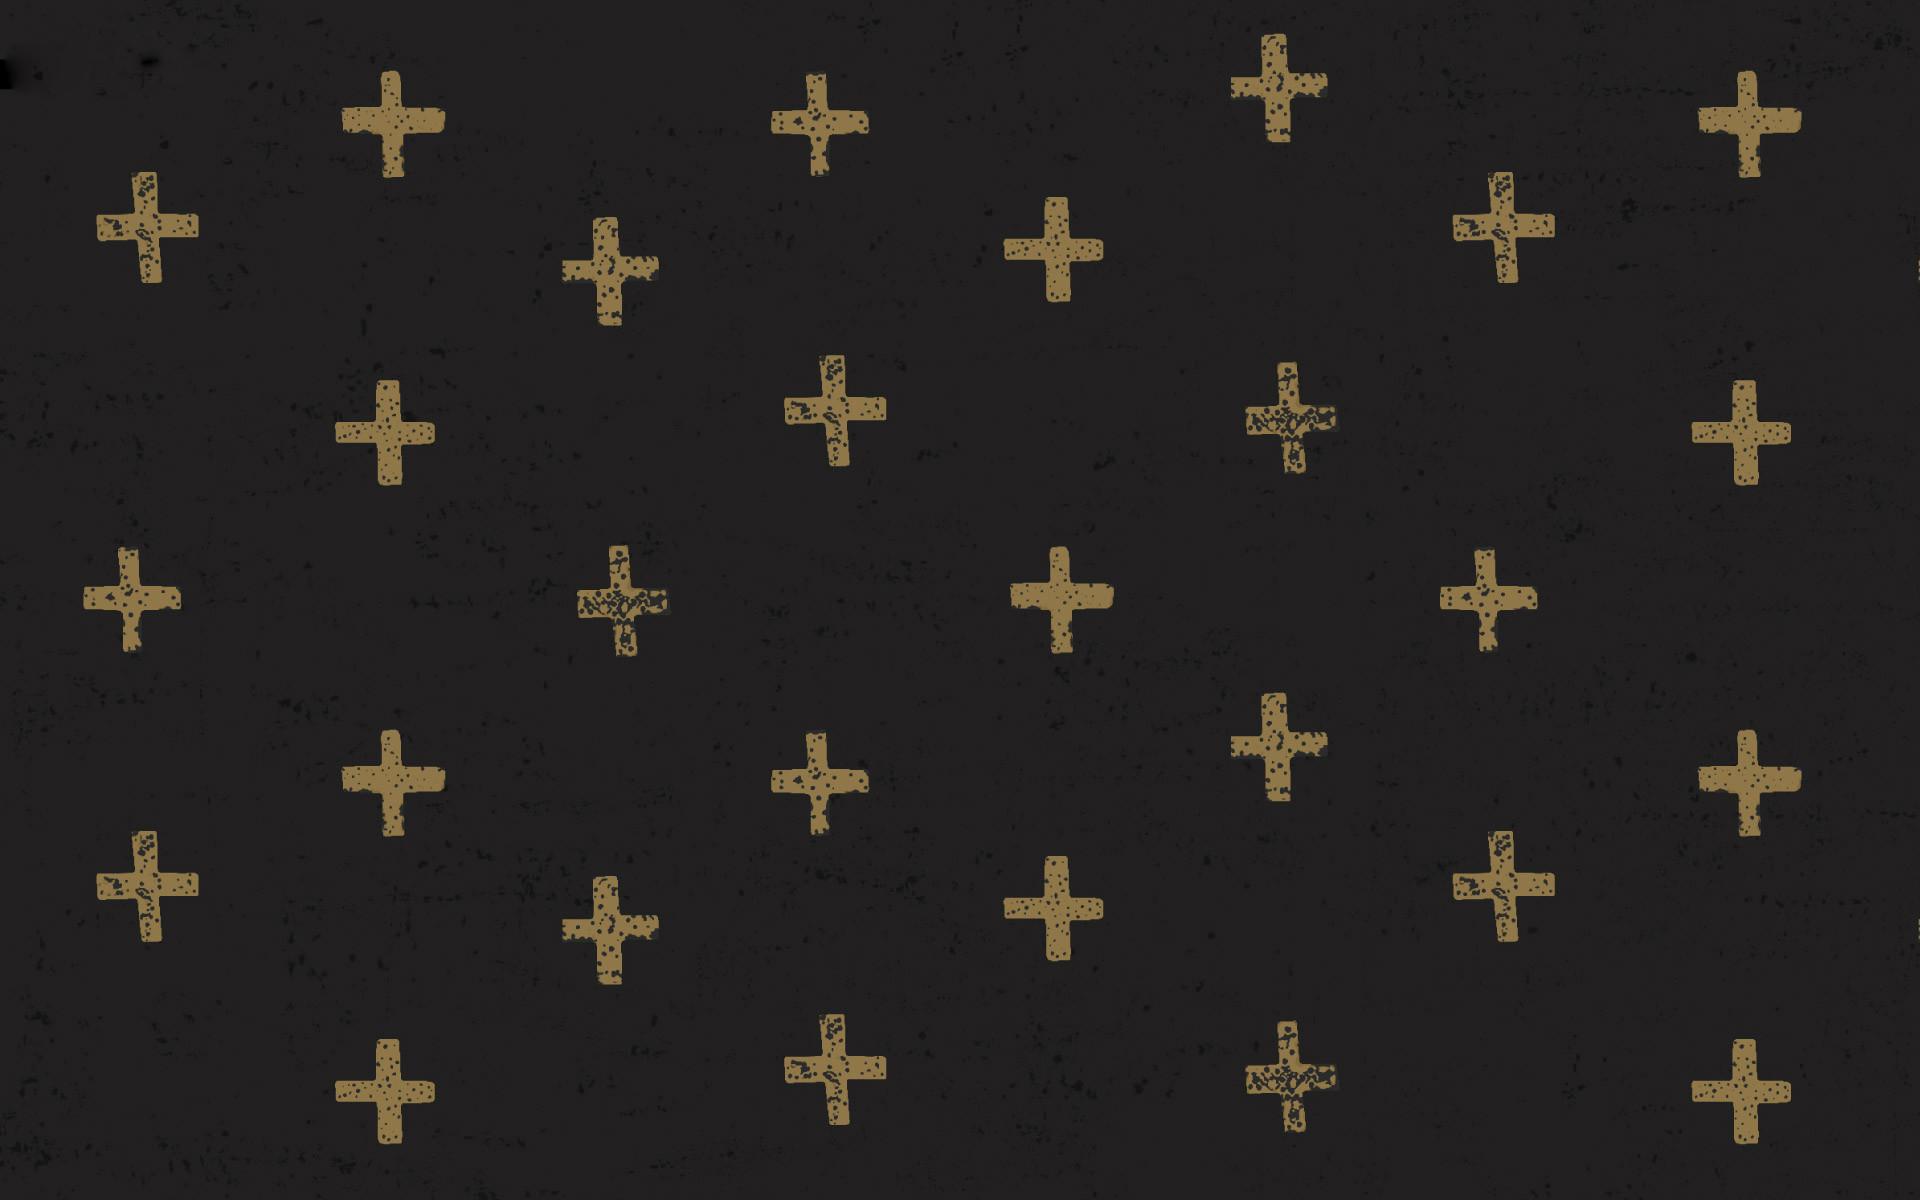 Black Bandana Wallpapers 183 ① Wallpapertag